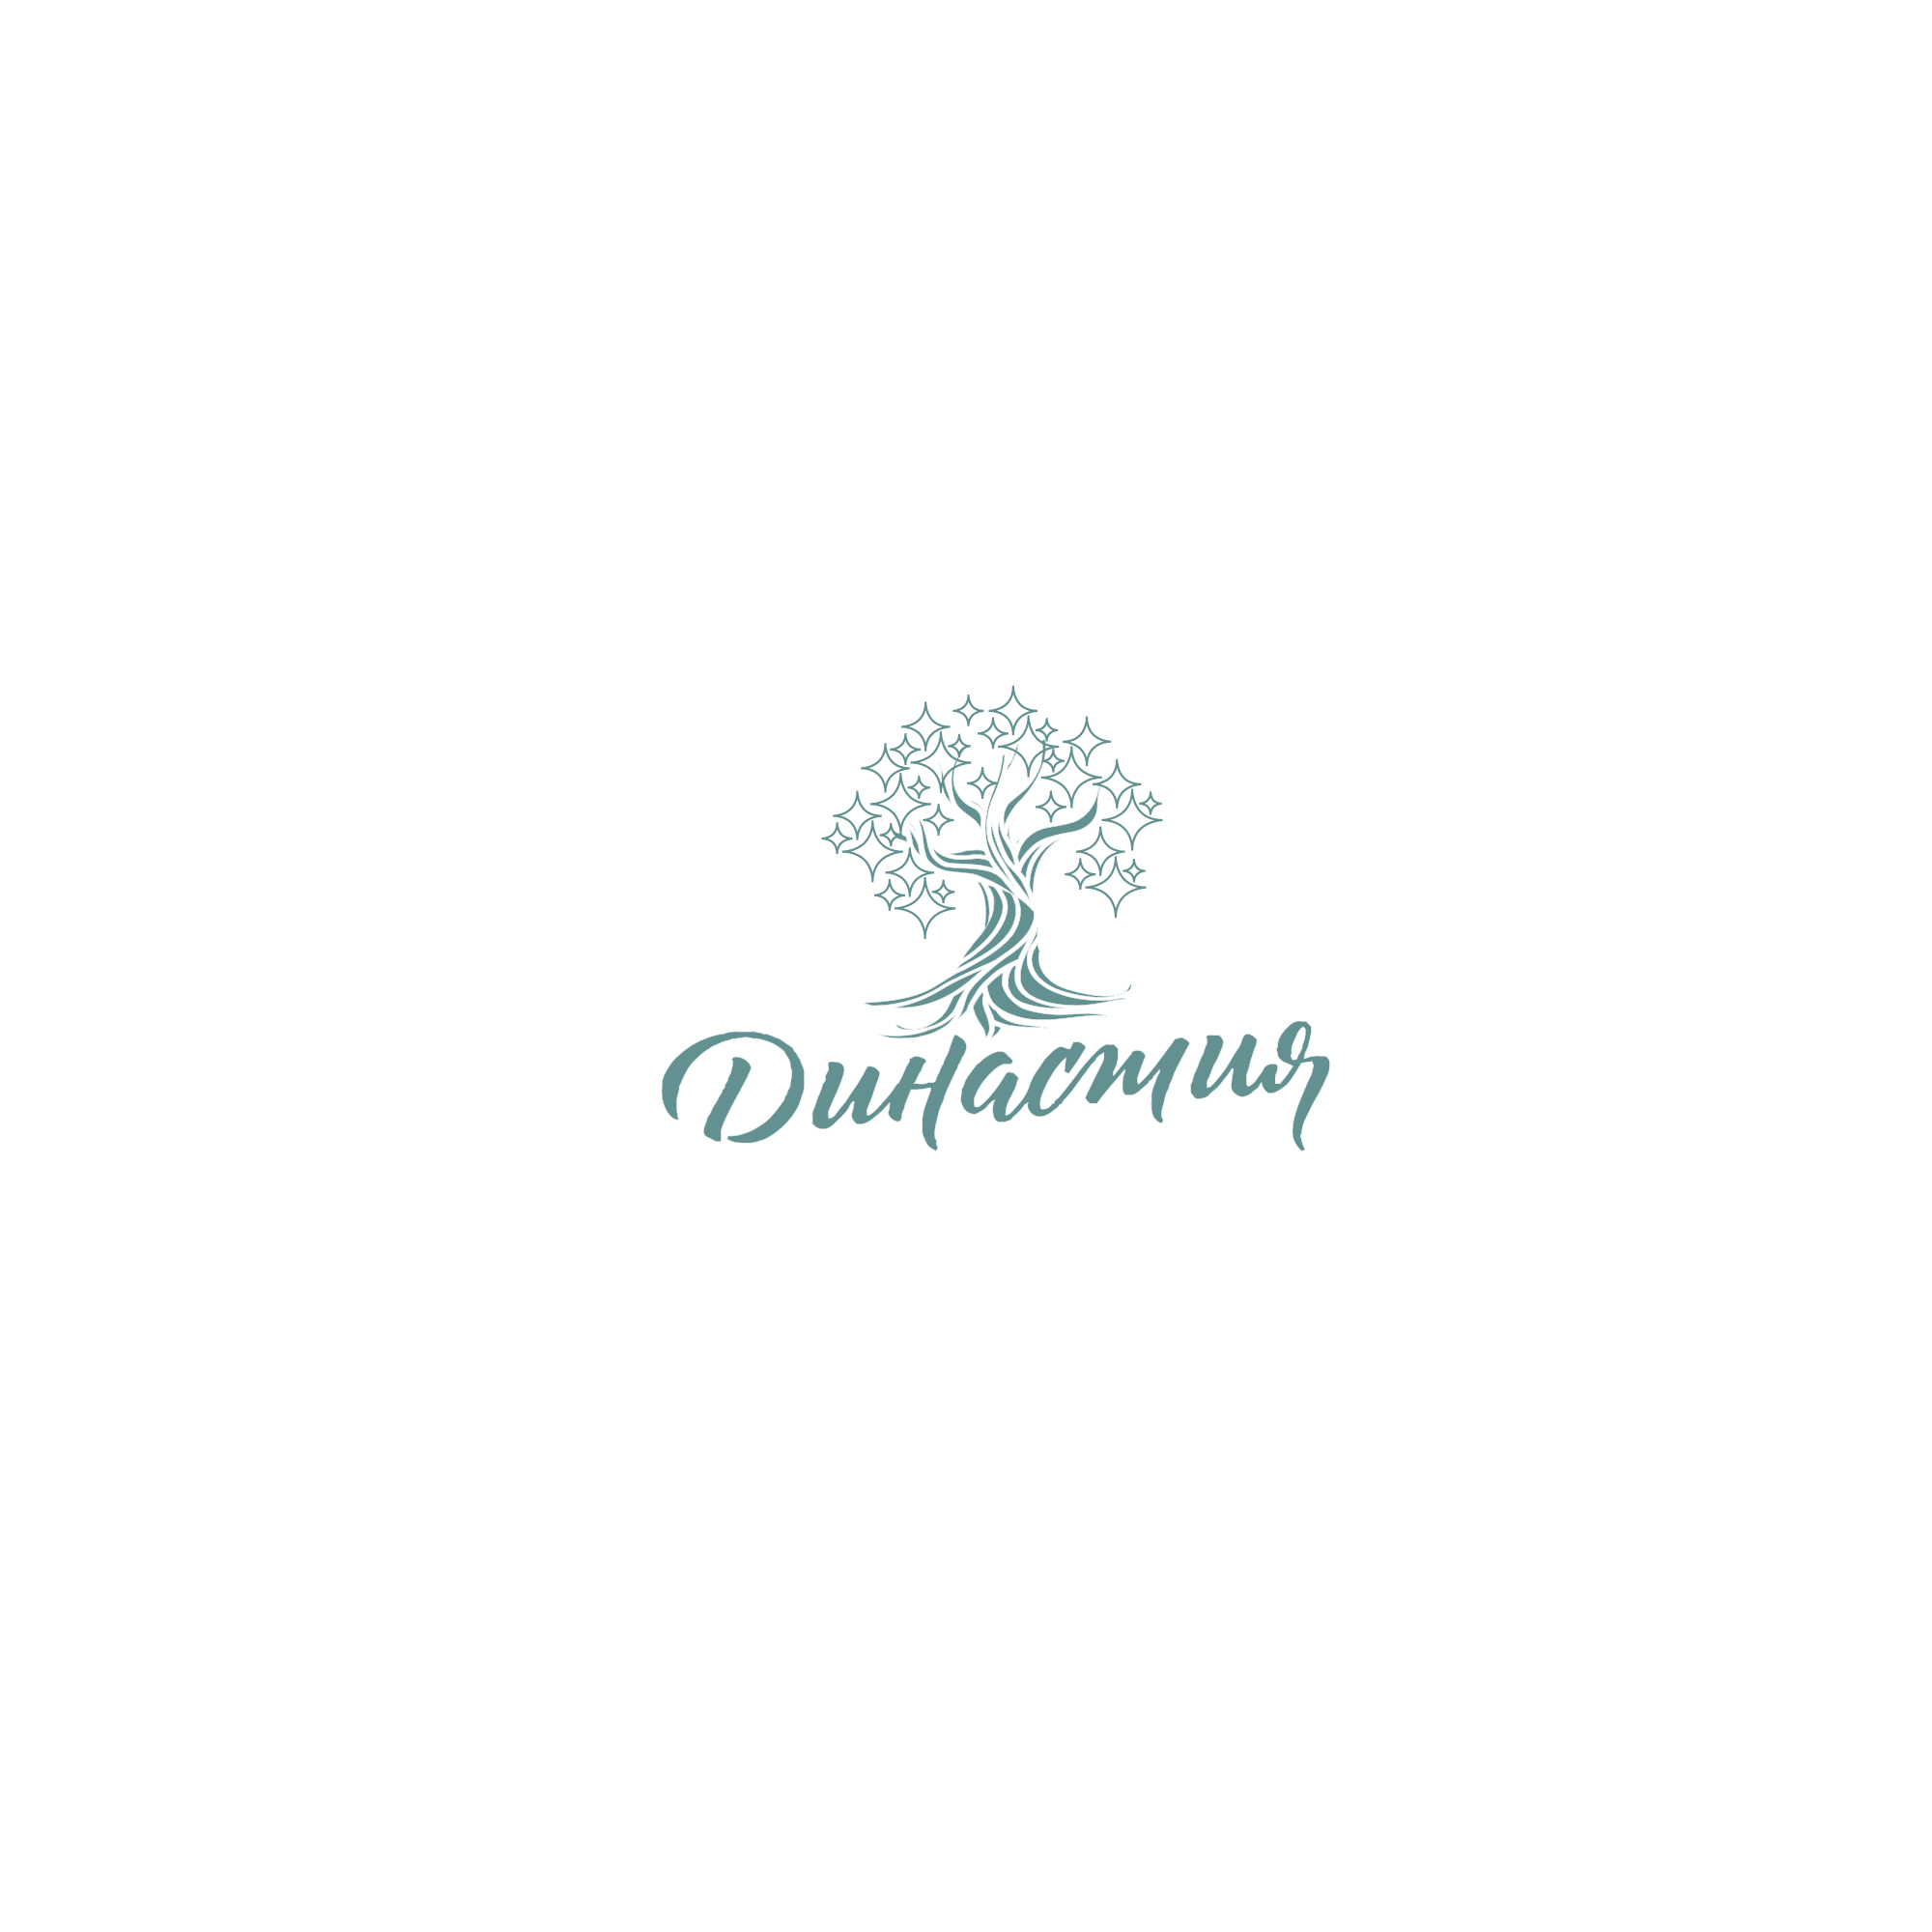 Разработать логотип для нового бренда фото f_36259f20ea17e4a6.jpg